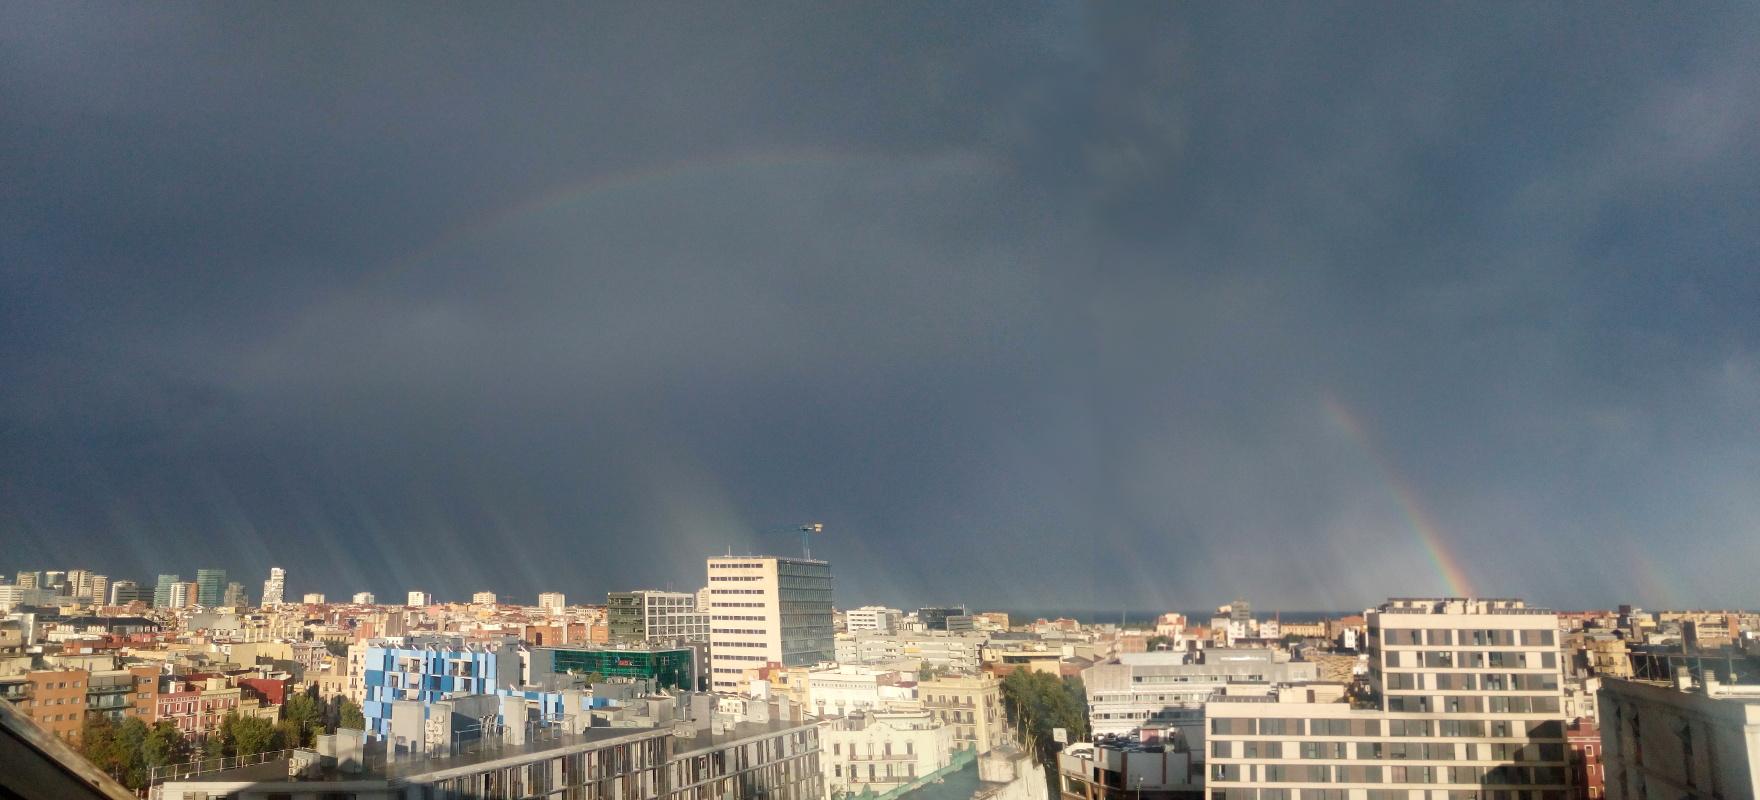 Duplo arco-íris sobre Poble Nou.